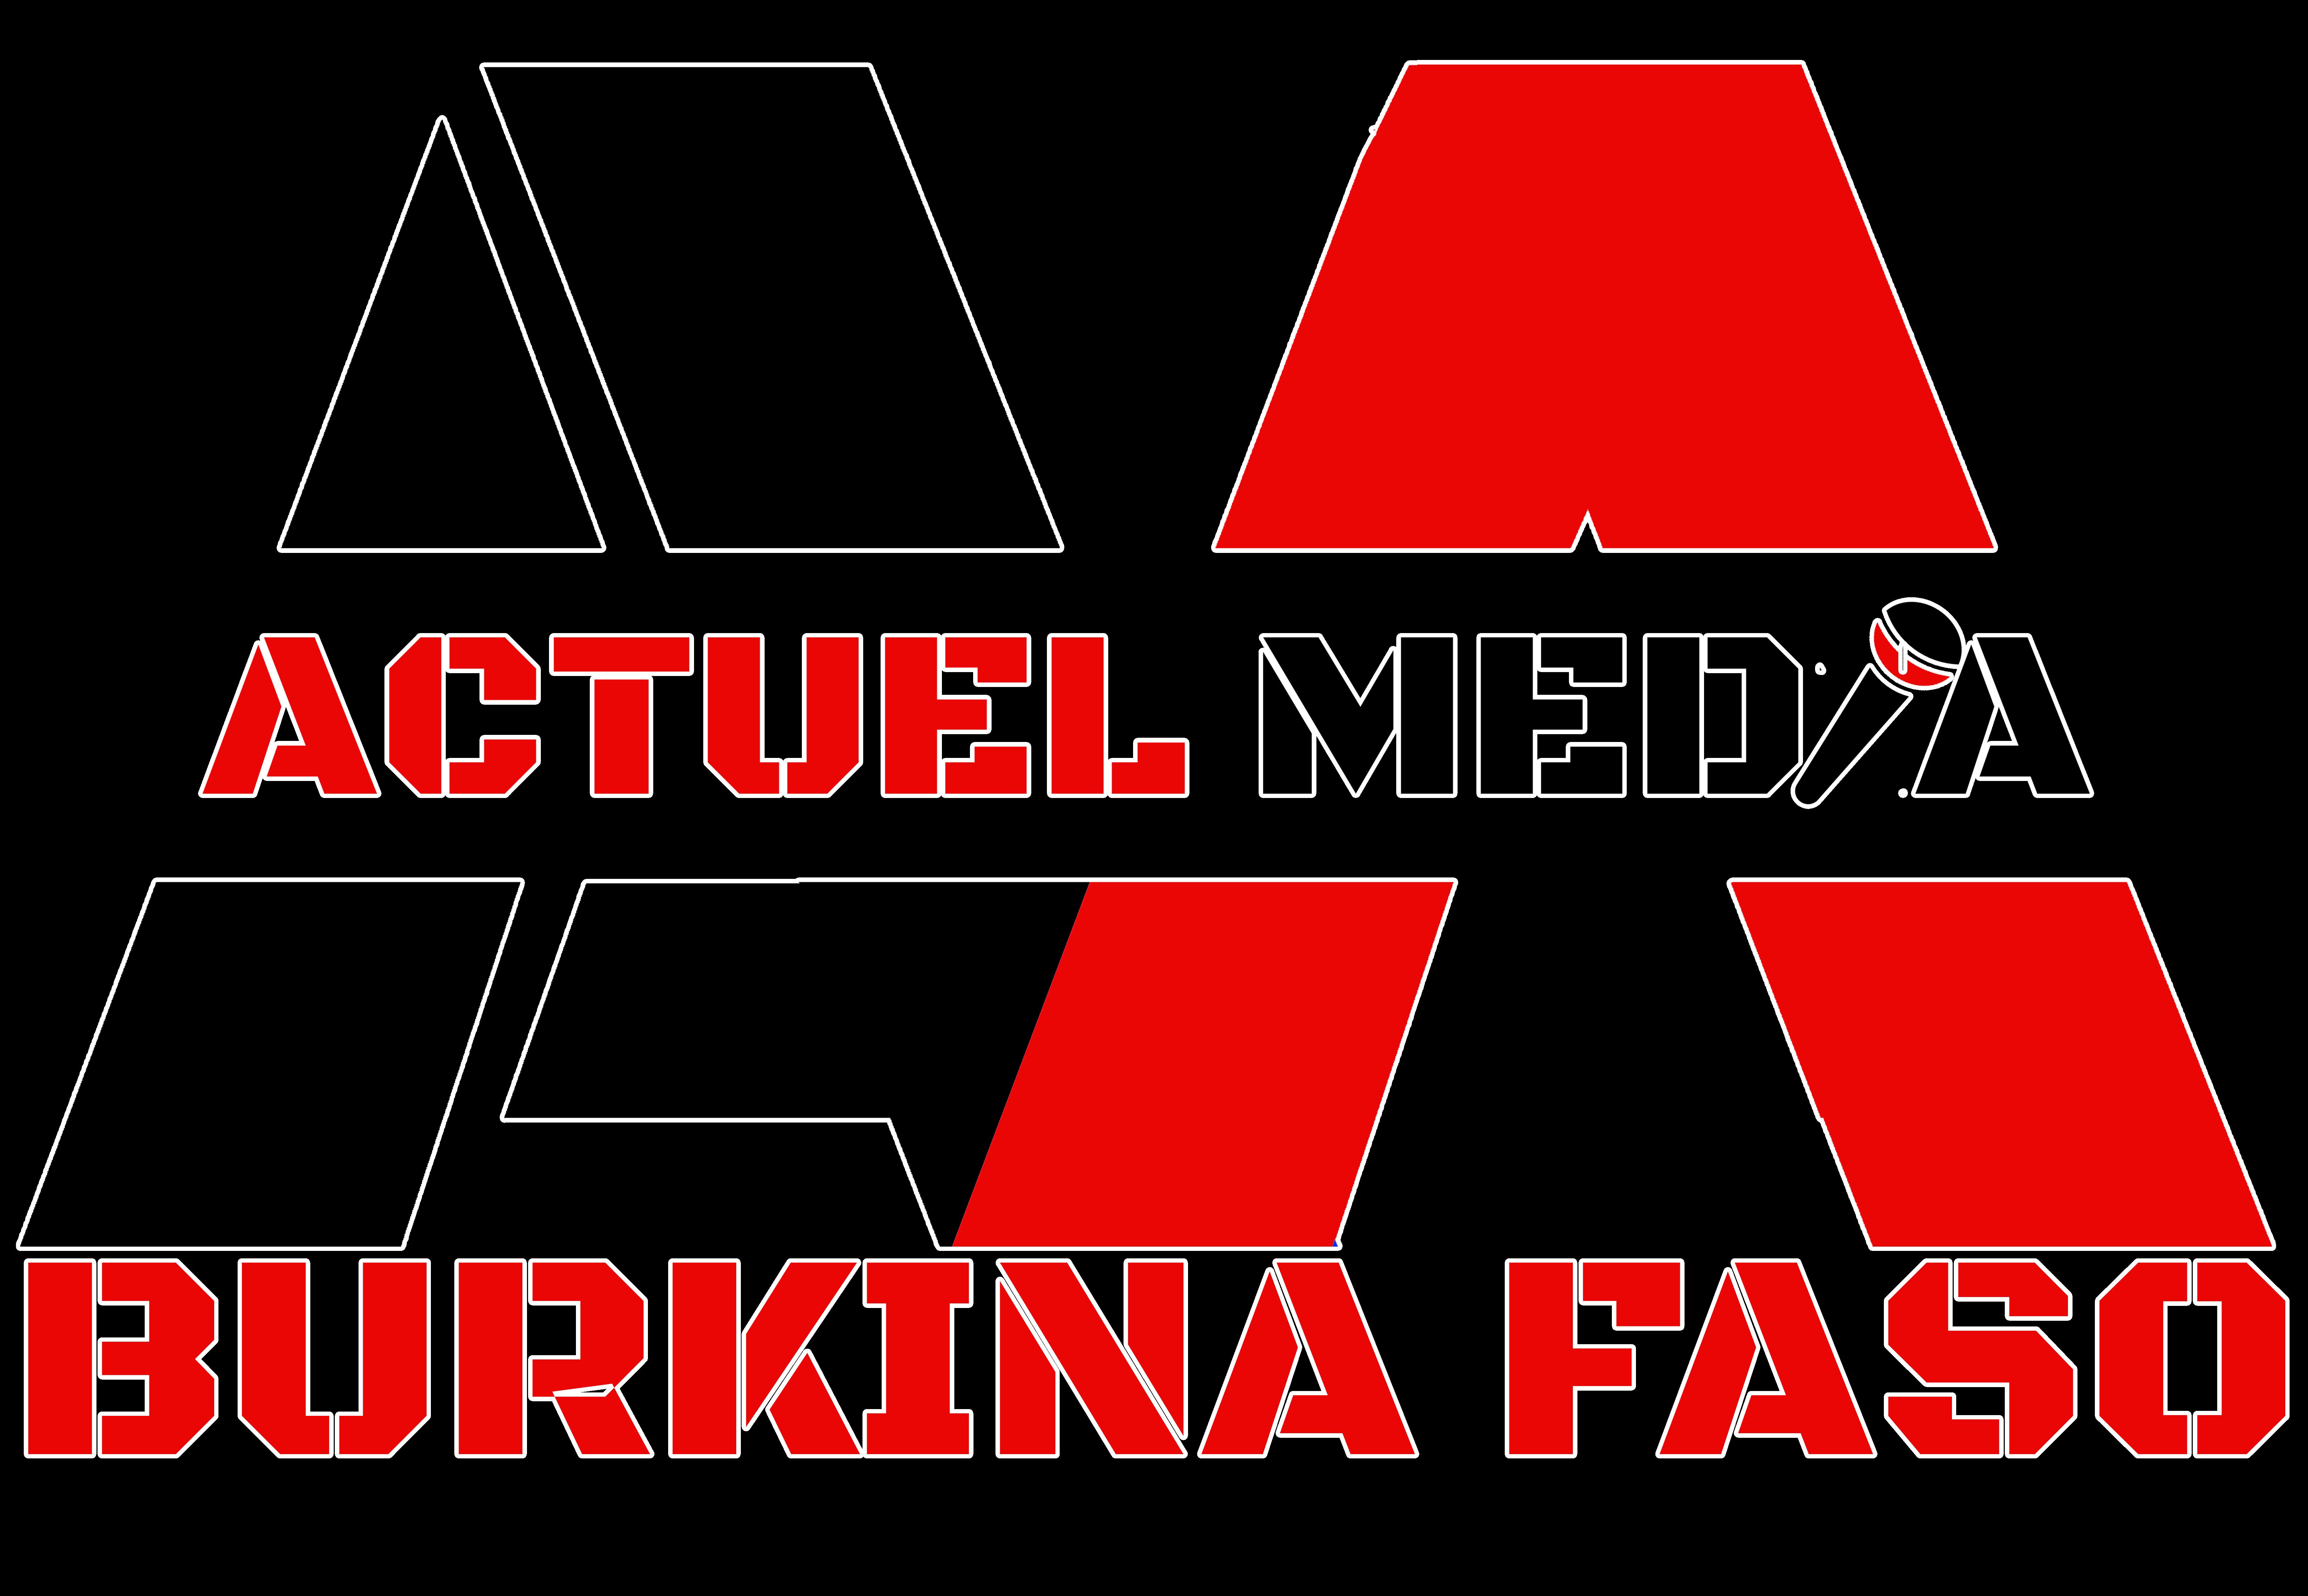 ACTUEL MEDIA BURKINA FASO